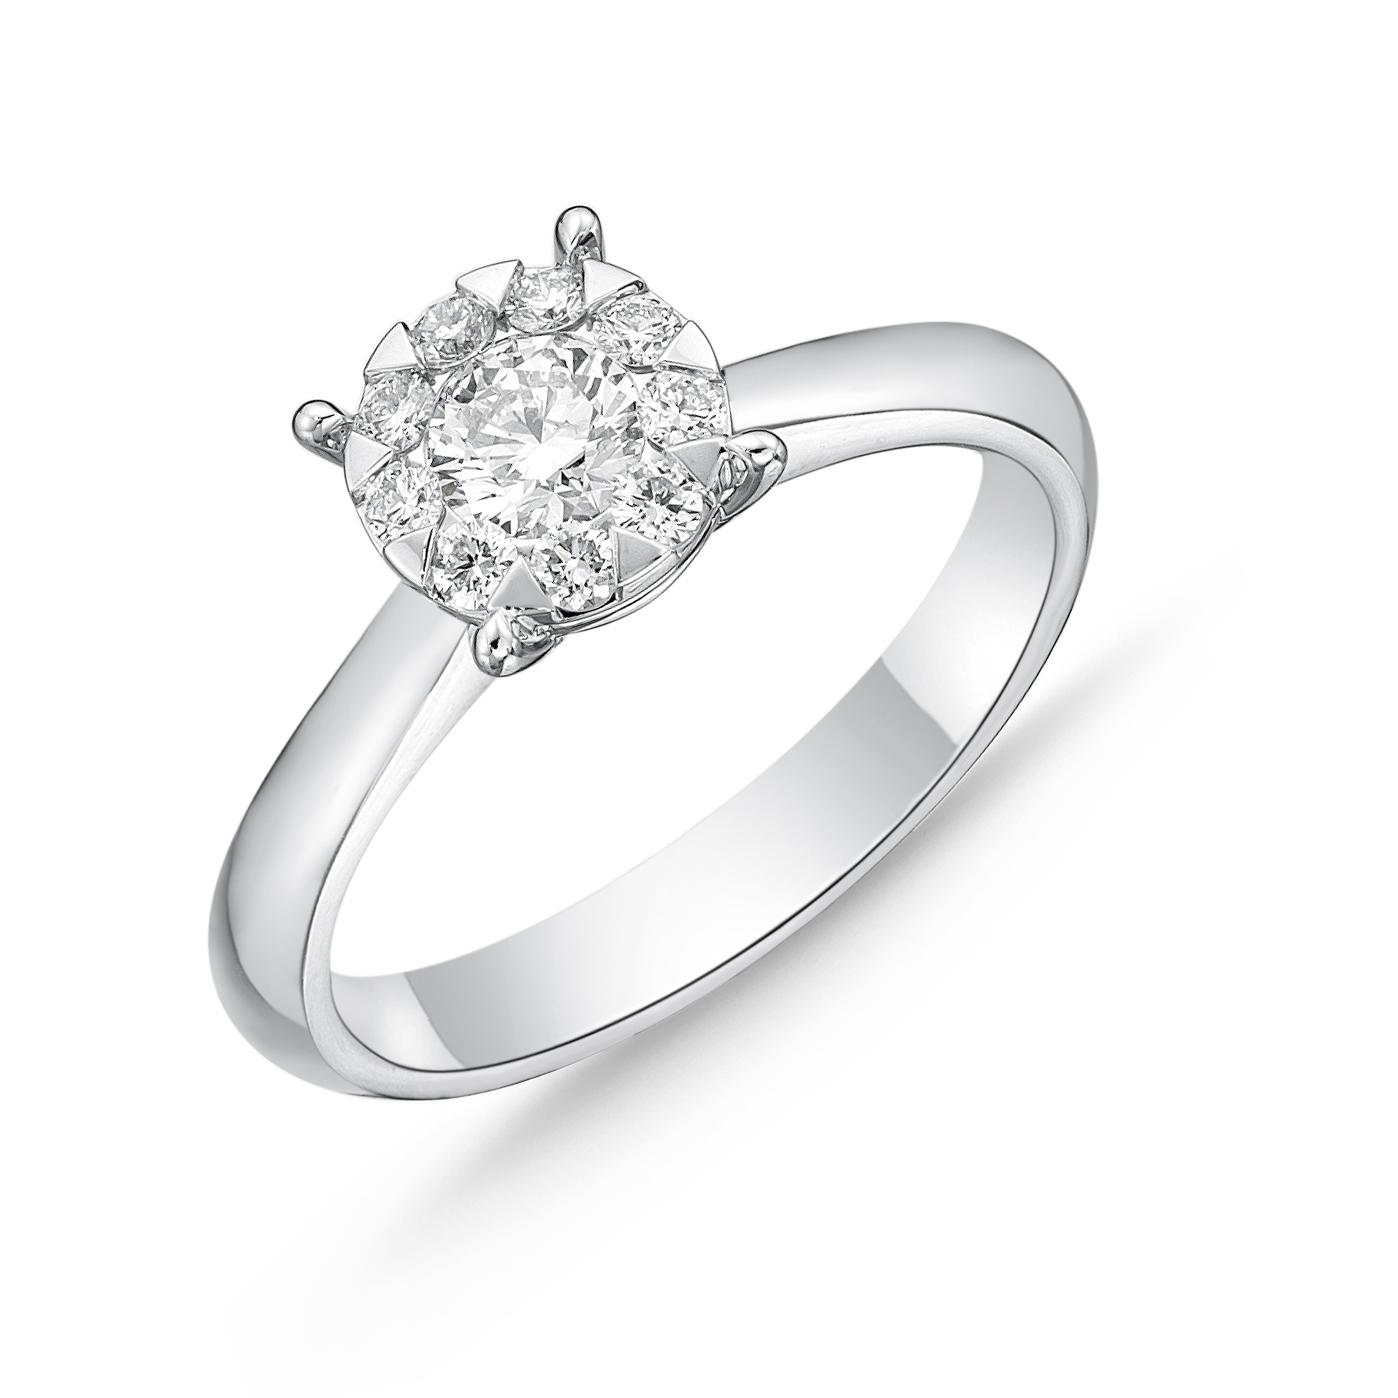 Memoire 18ct White Gold 0.45 Carat Diamond Bouquet Solitaire Ring